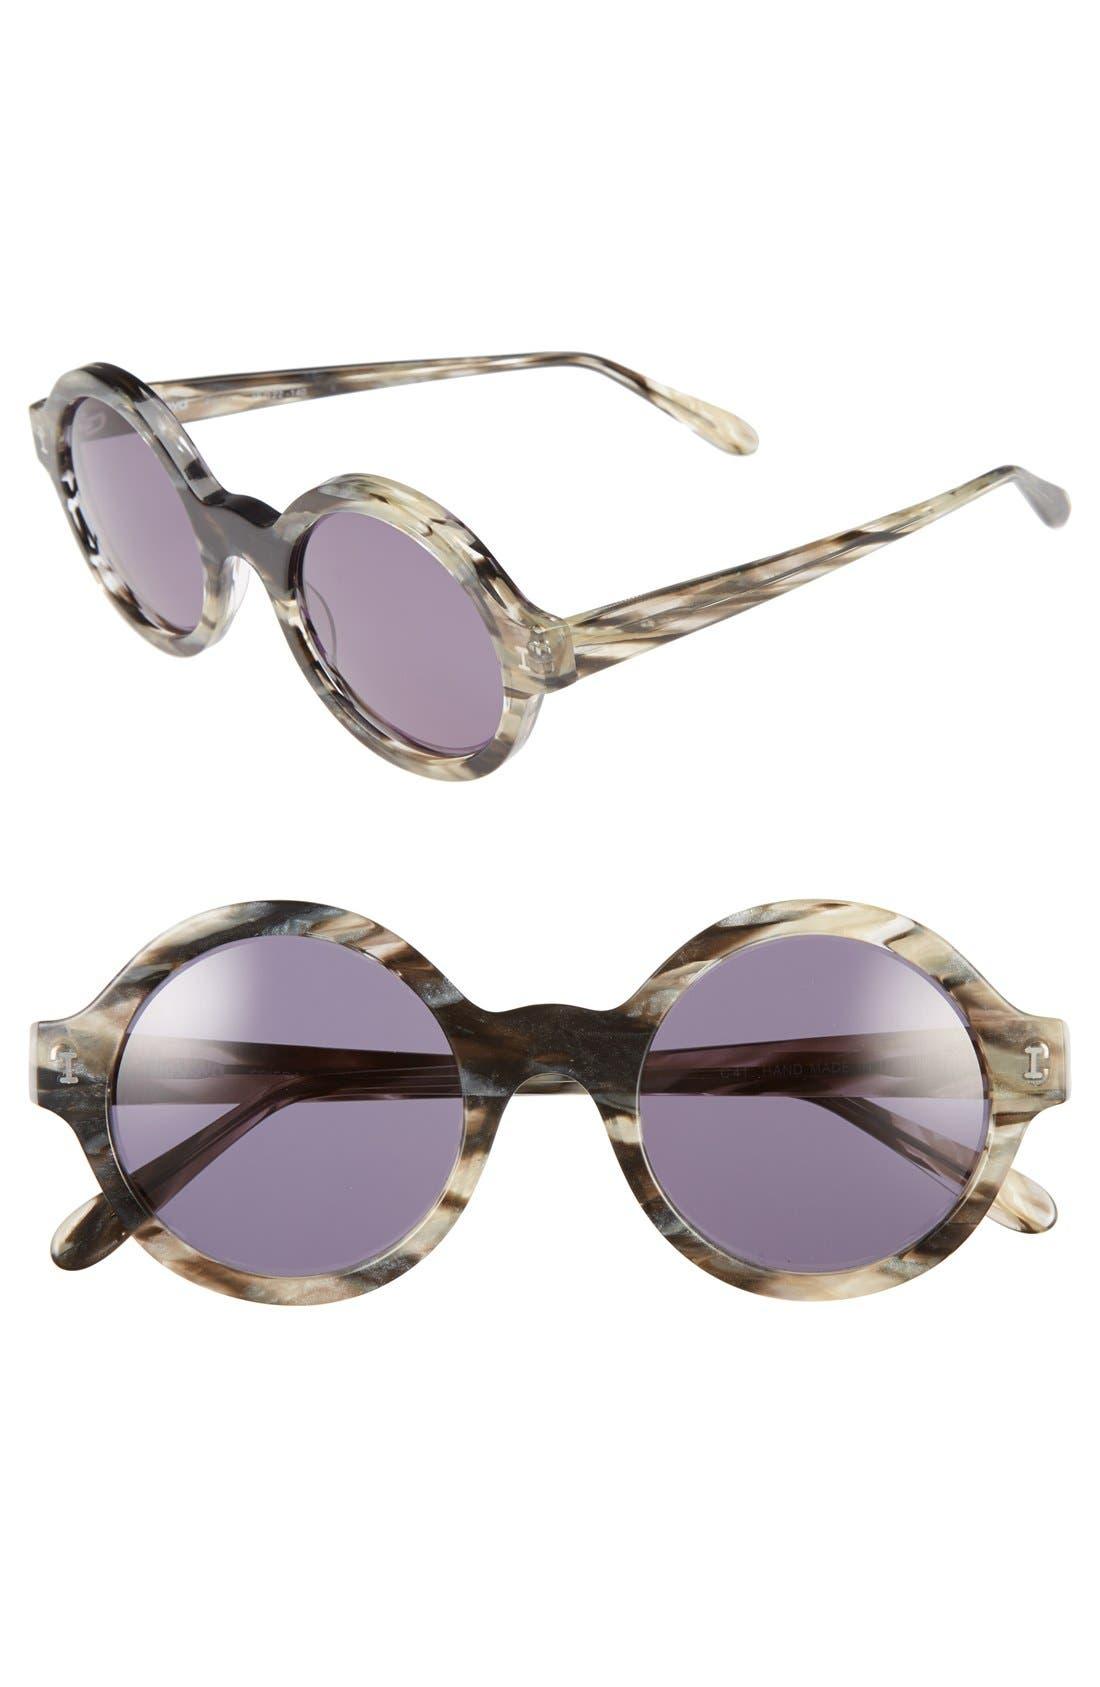 Alternate Image 1 Selected - Illesteva 'Frieda' 48mm Retro Sunglasses